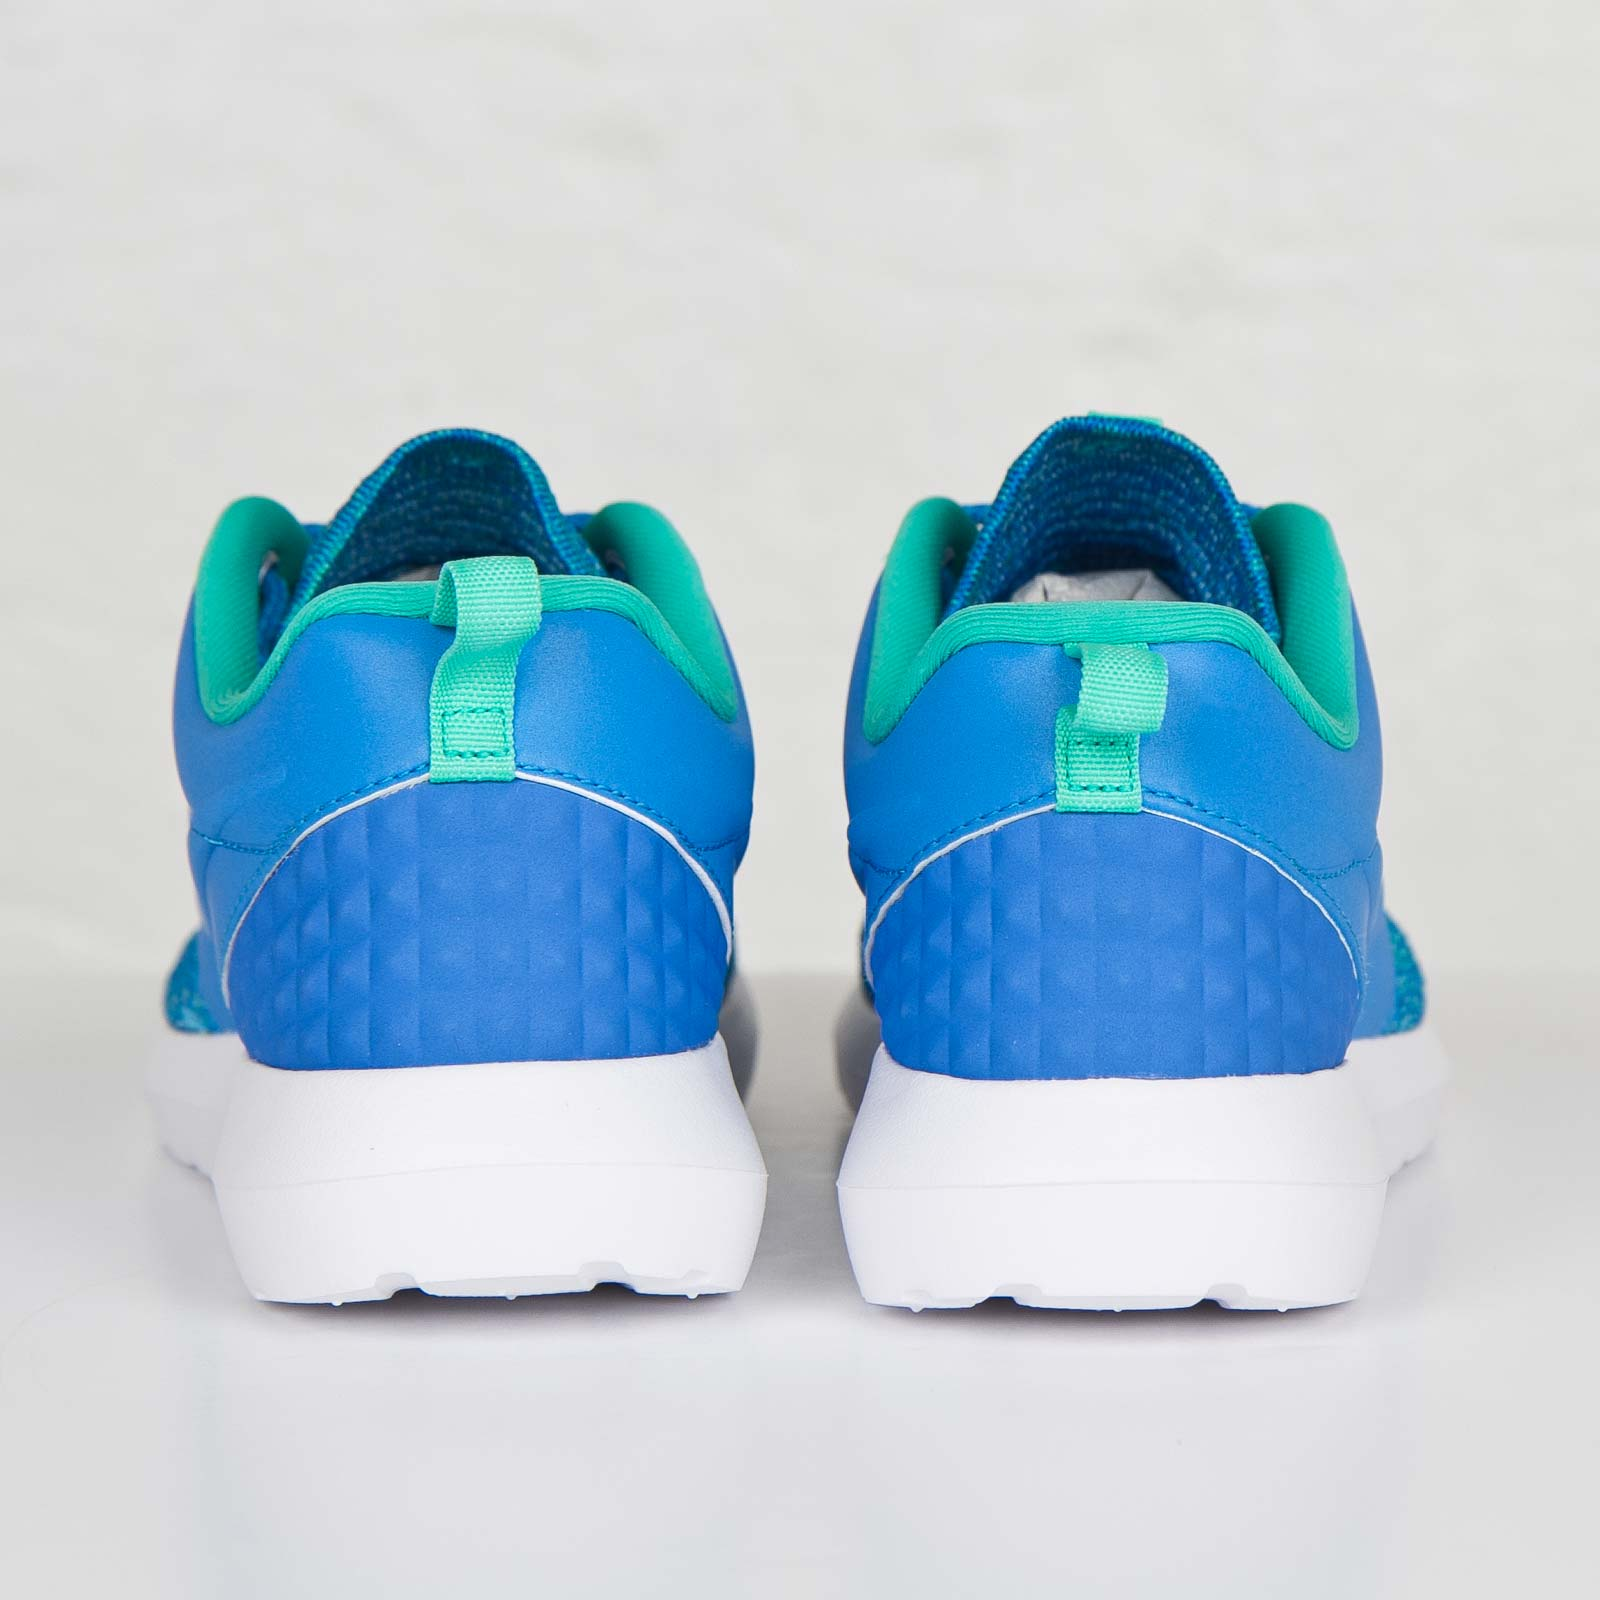 170400602100b Nike Roshe NM Flyknit Premium - 746825-400 - Sneakersnstuff ...